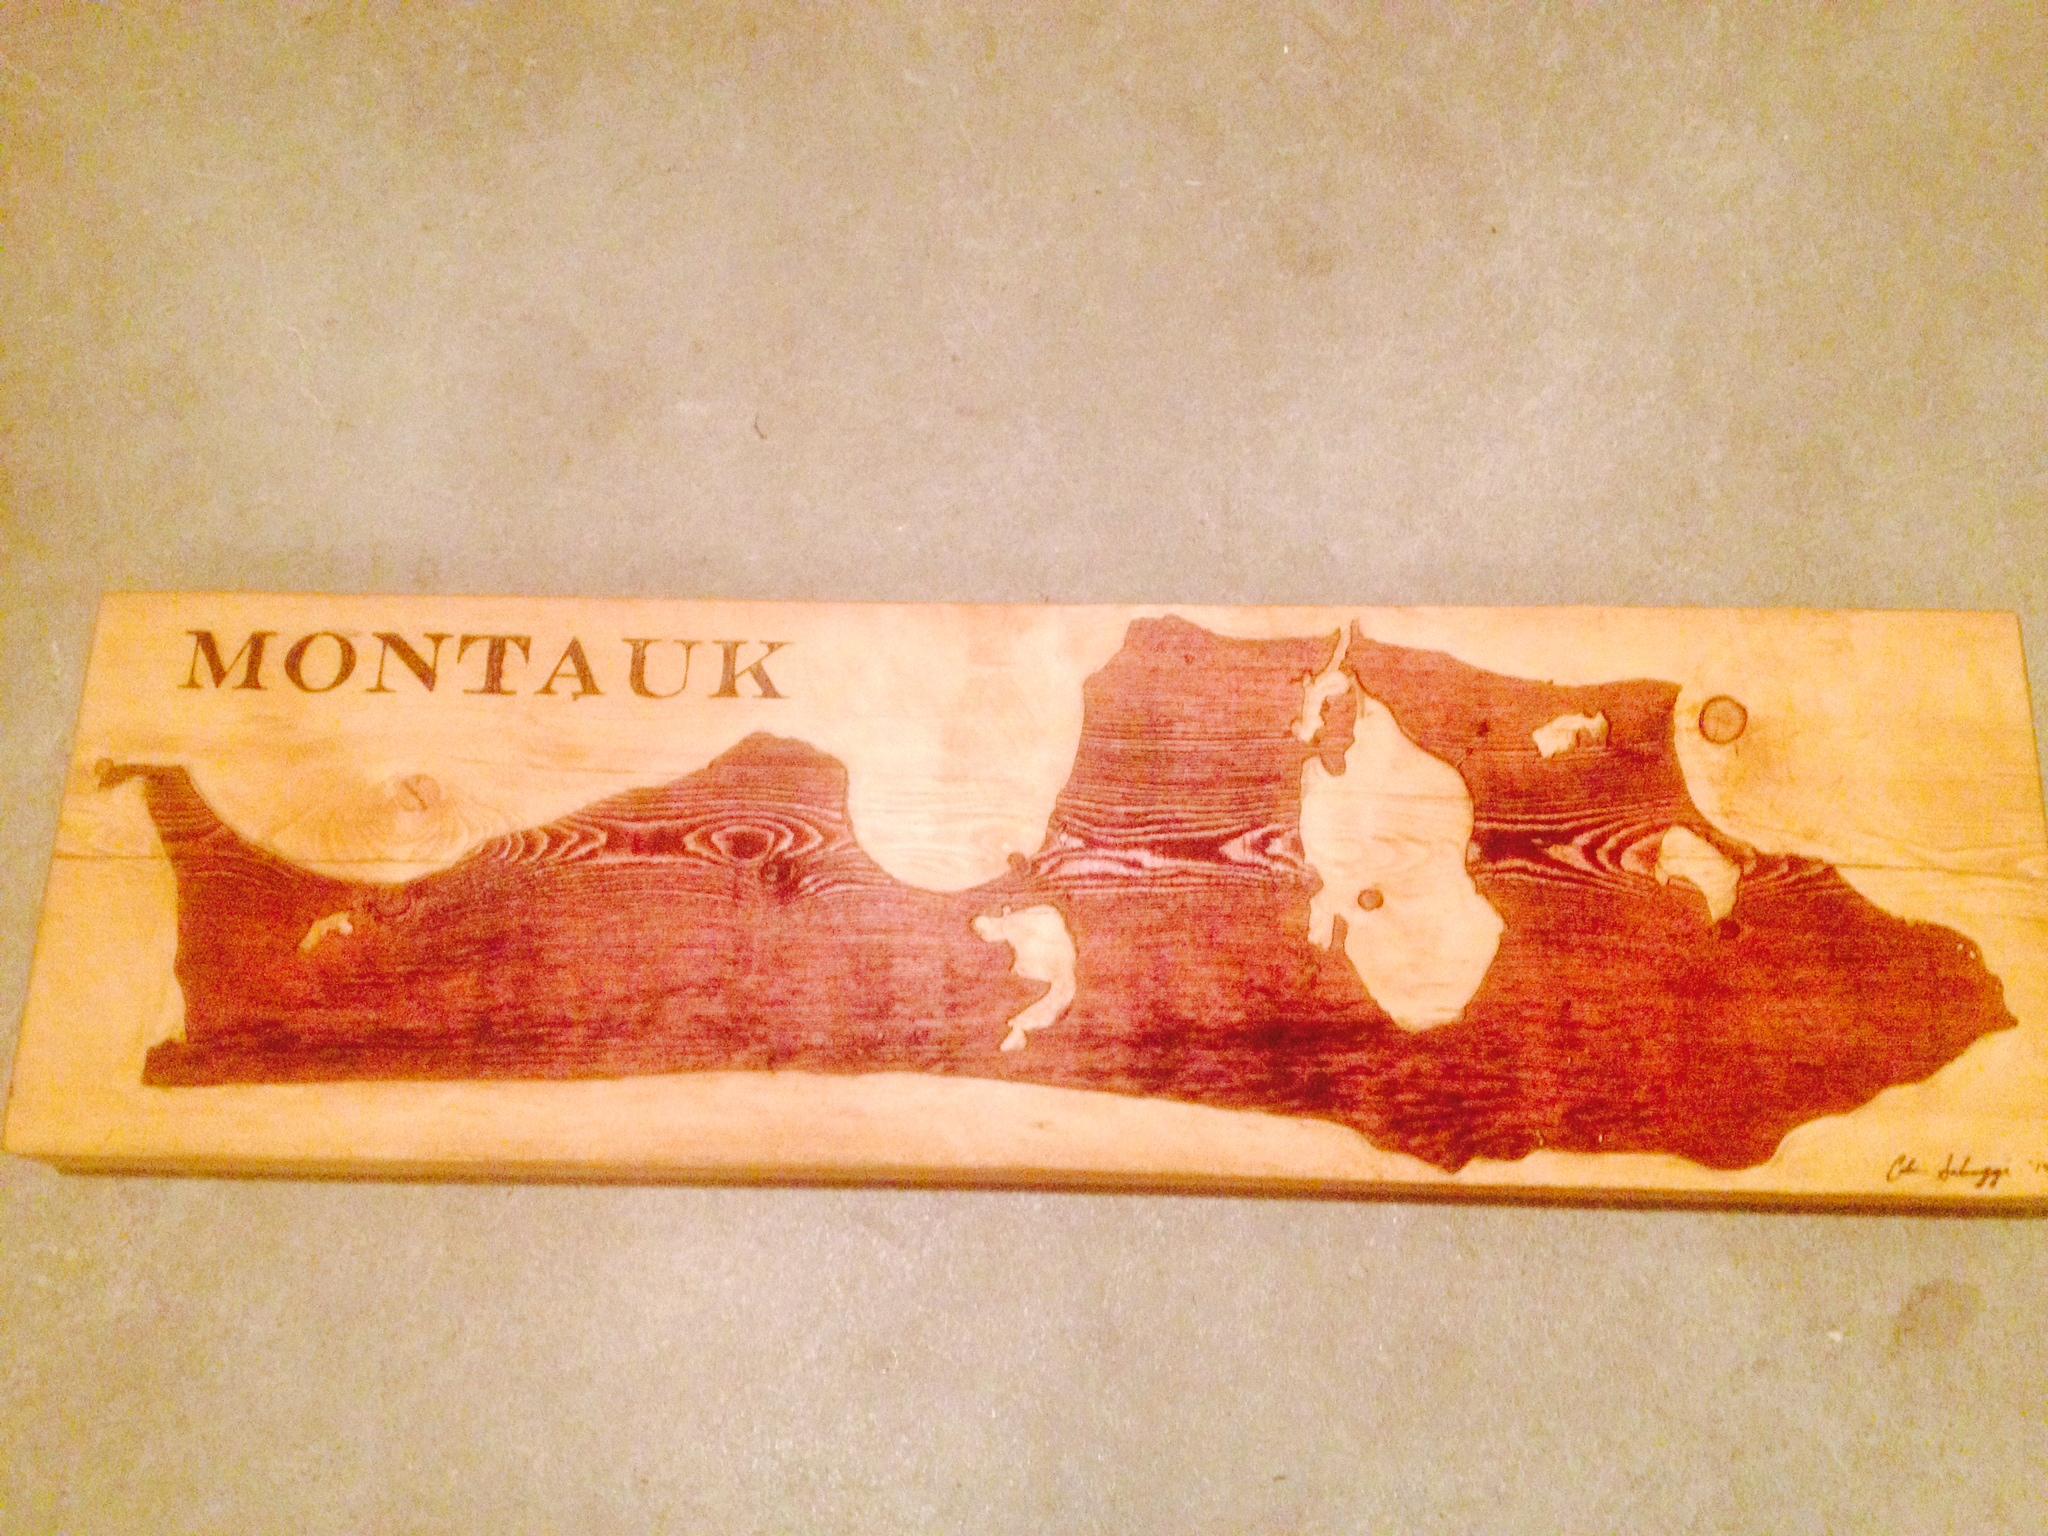 Montauk Plank Carving